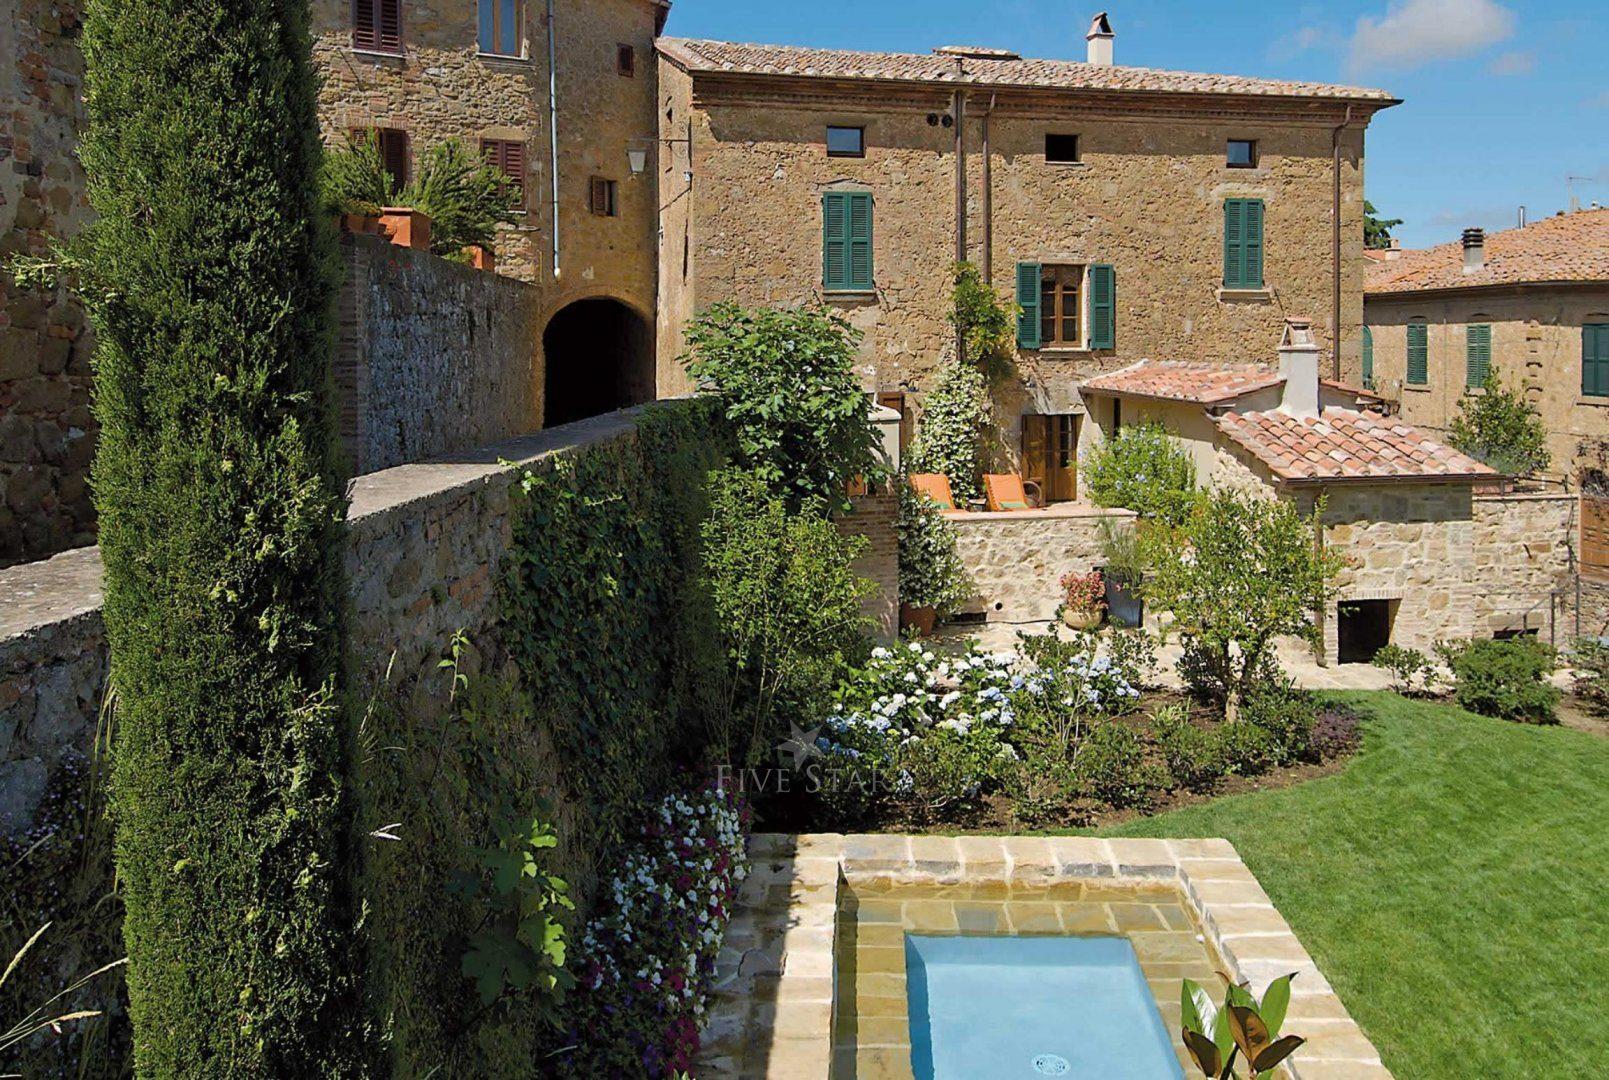 La Residenza photo 1